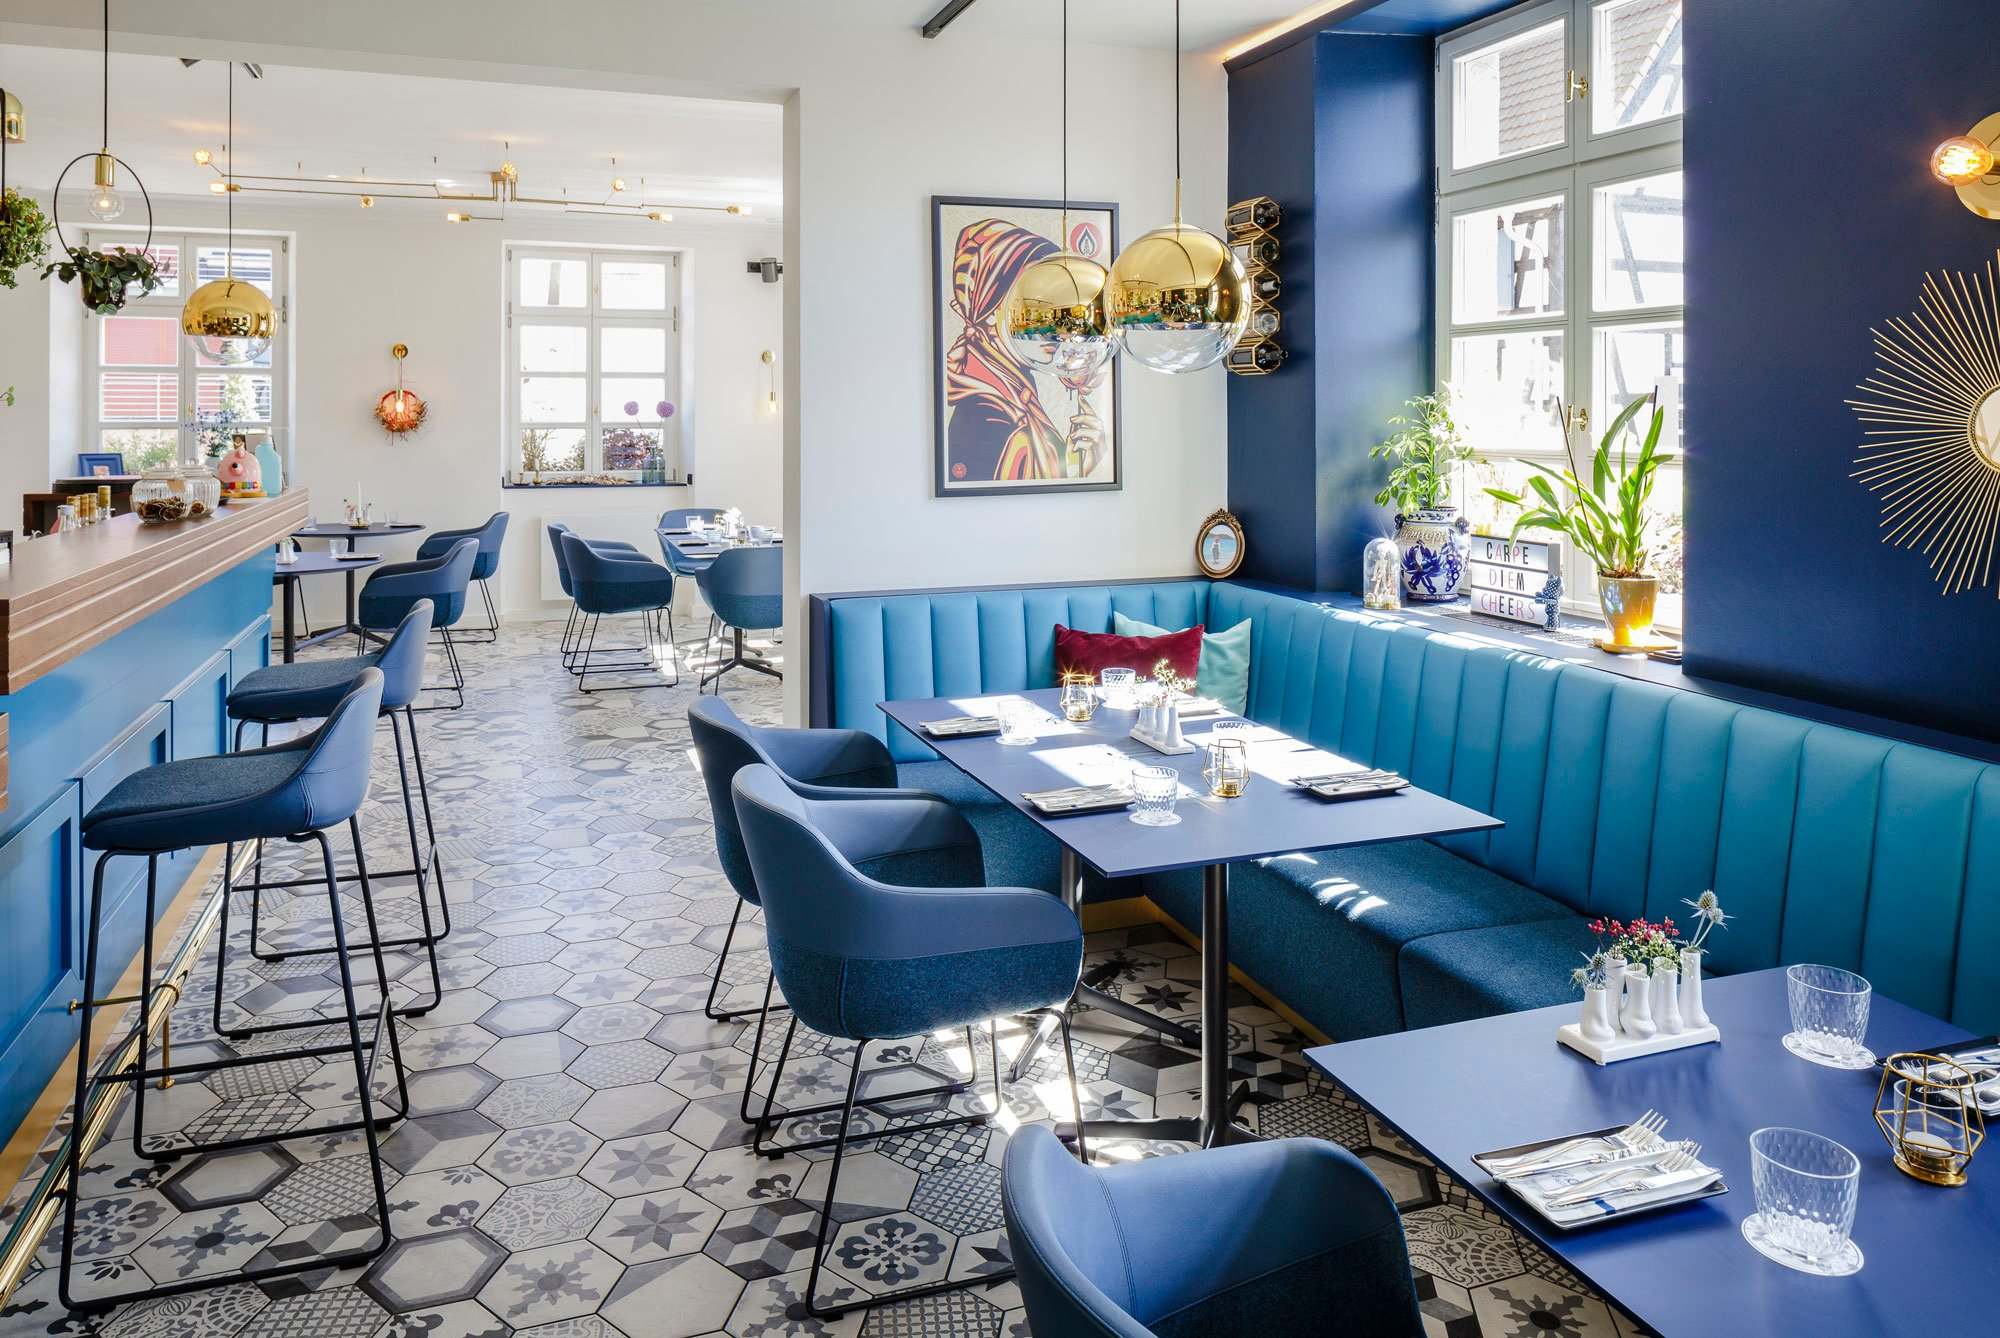 Zu Besuch im Restaurant Gioias in Rheinau